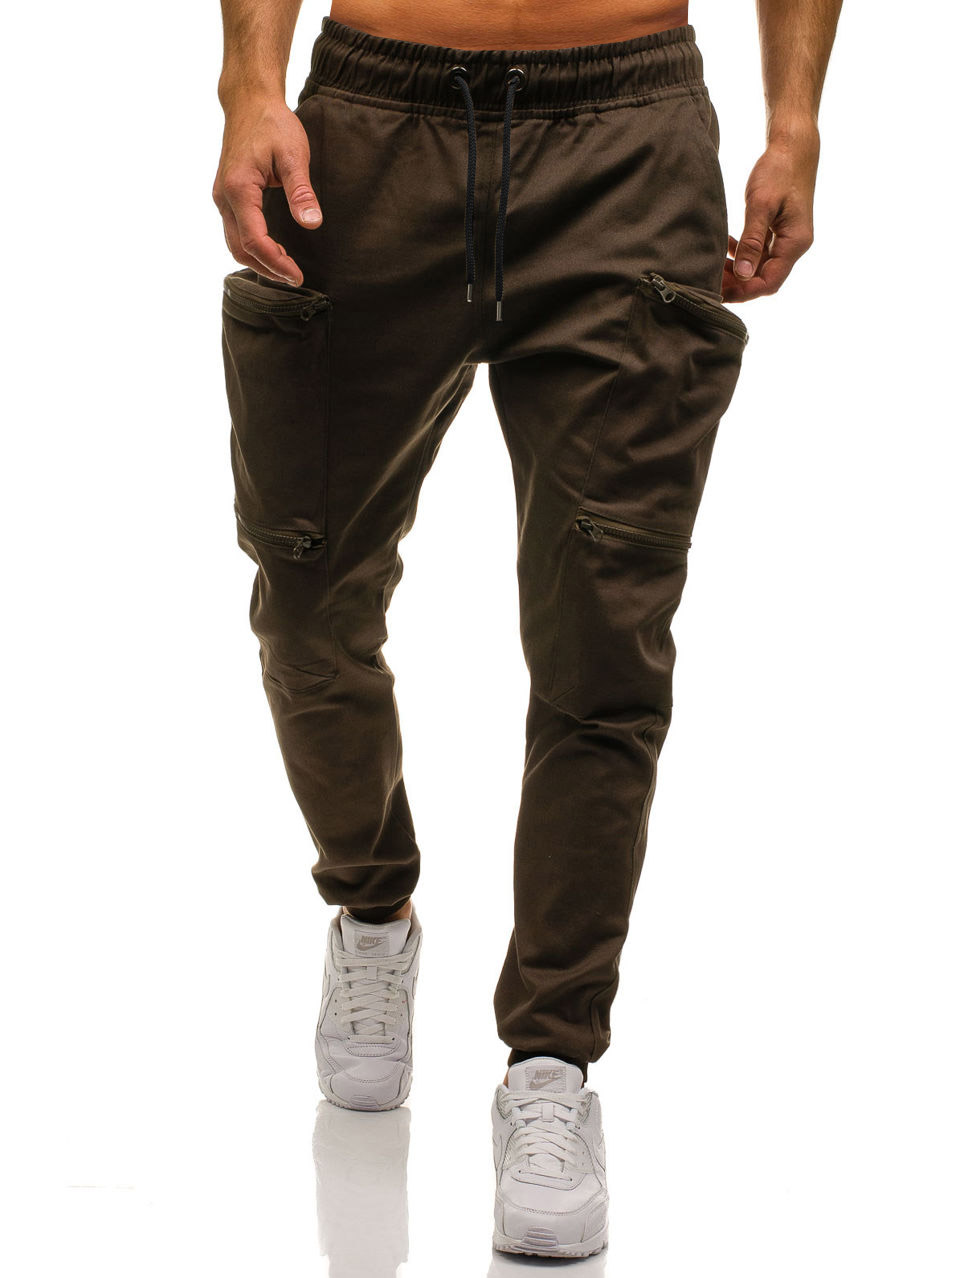 HTB1ajjlLVzqK1RjSZFvq6AB7VXaJ Mens Joggers 2019 New Red Camouflage Multi-Pockets Cargo Pants Men Cotton Harem Pants Hip Hop Trousers Streetwear XXXL